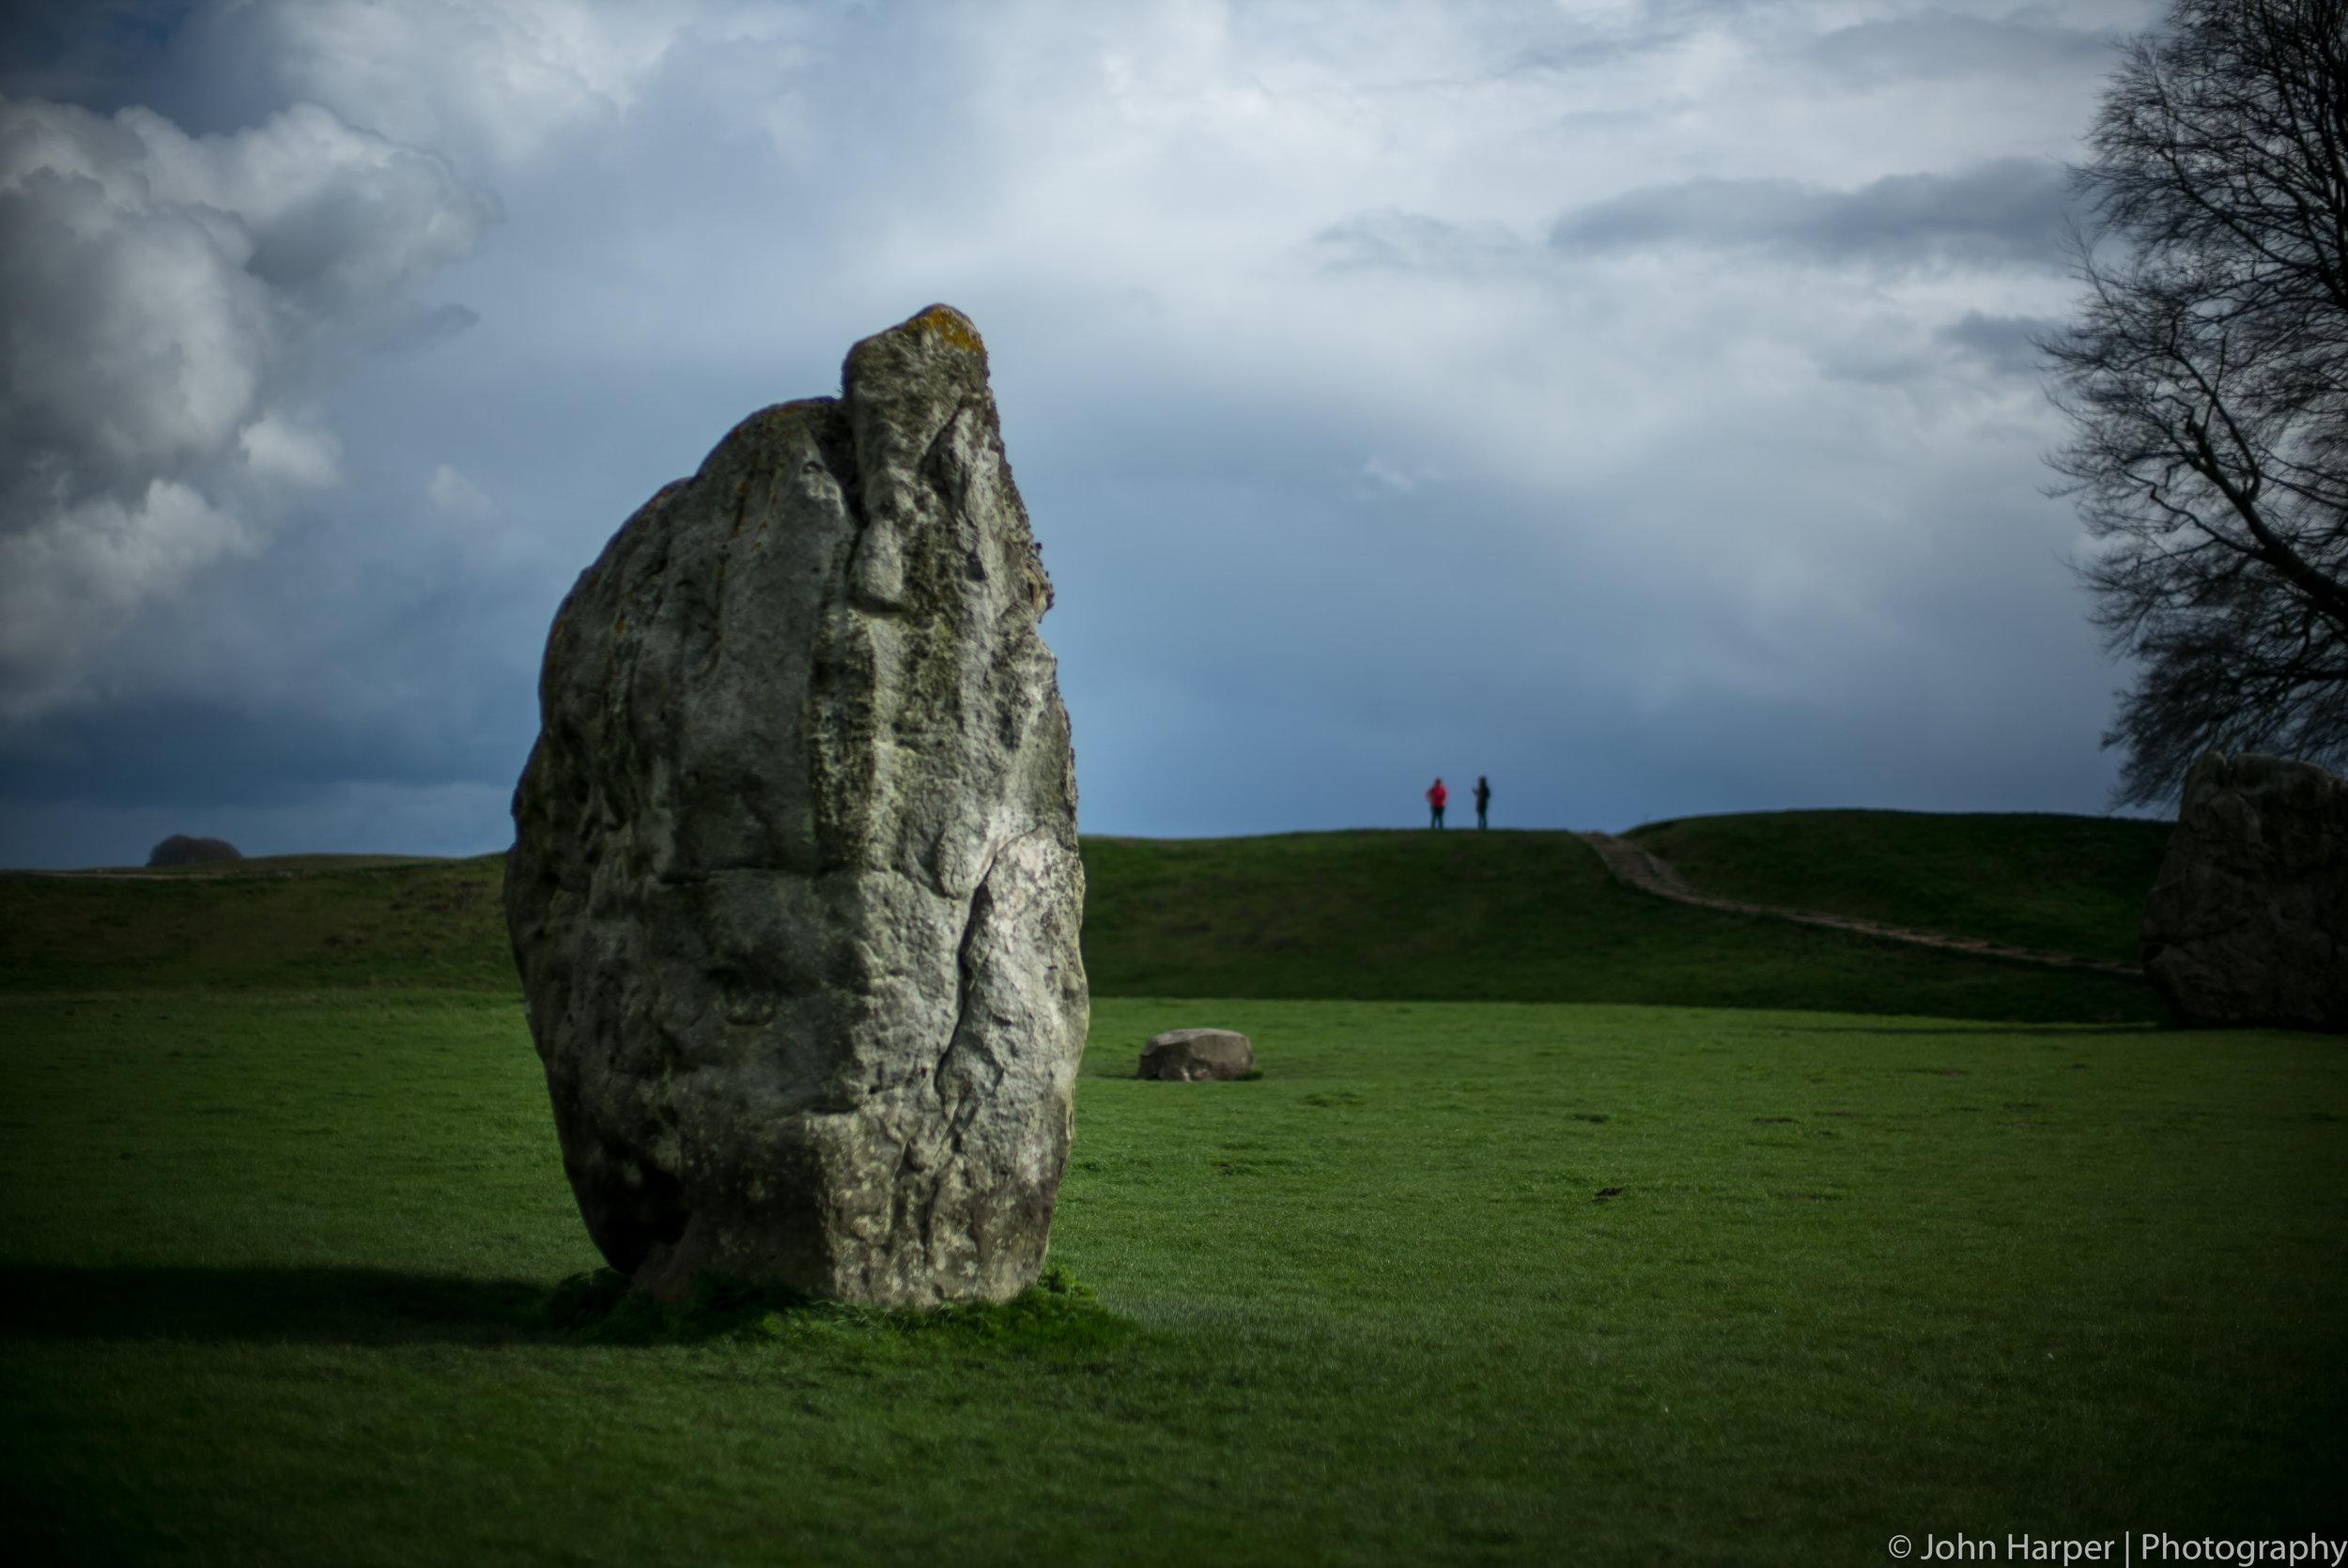 Avebury Stone and People